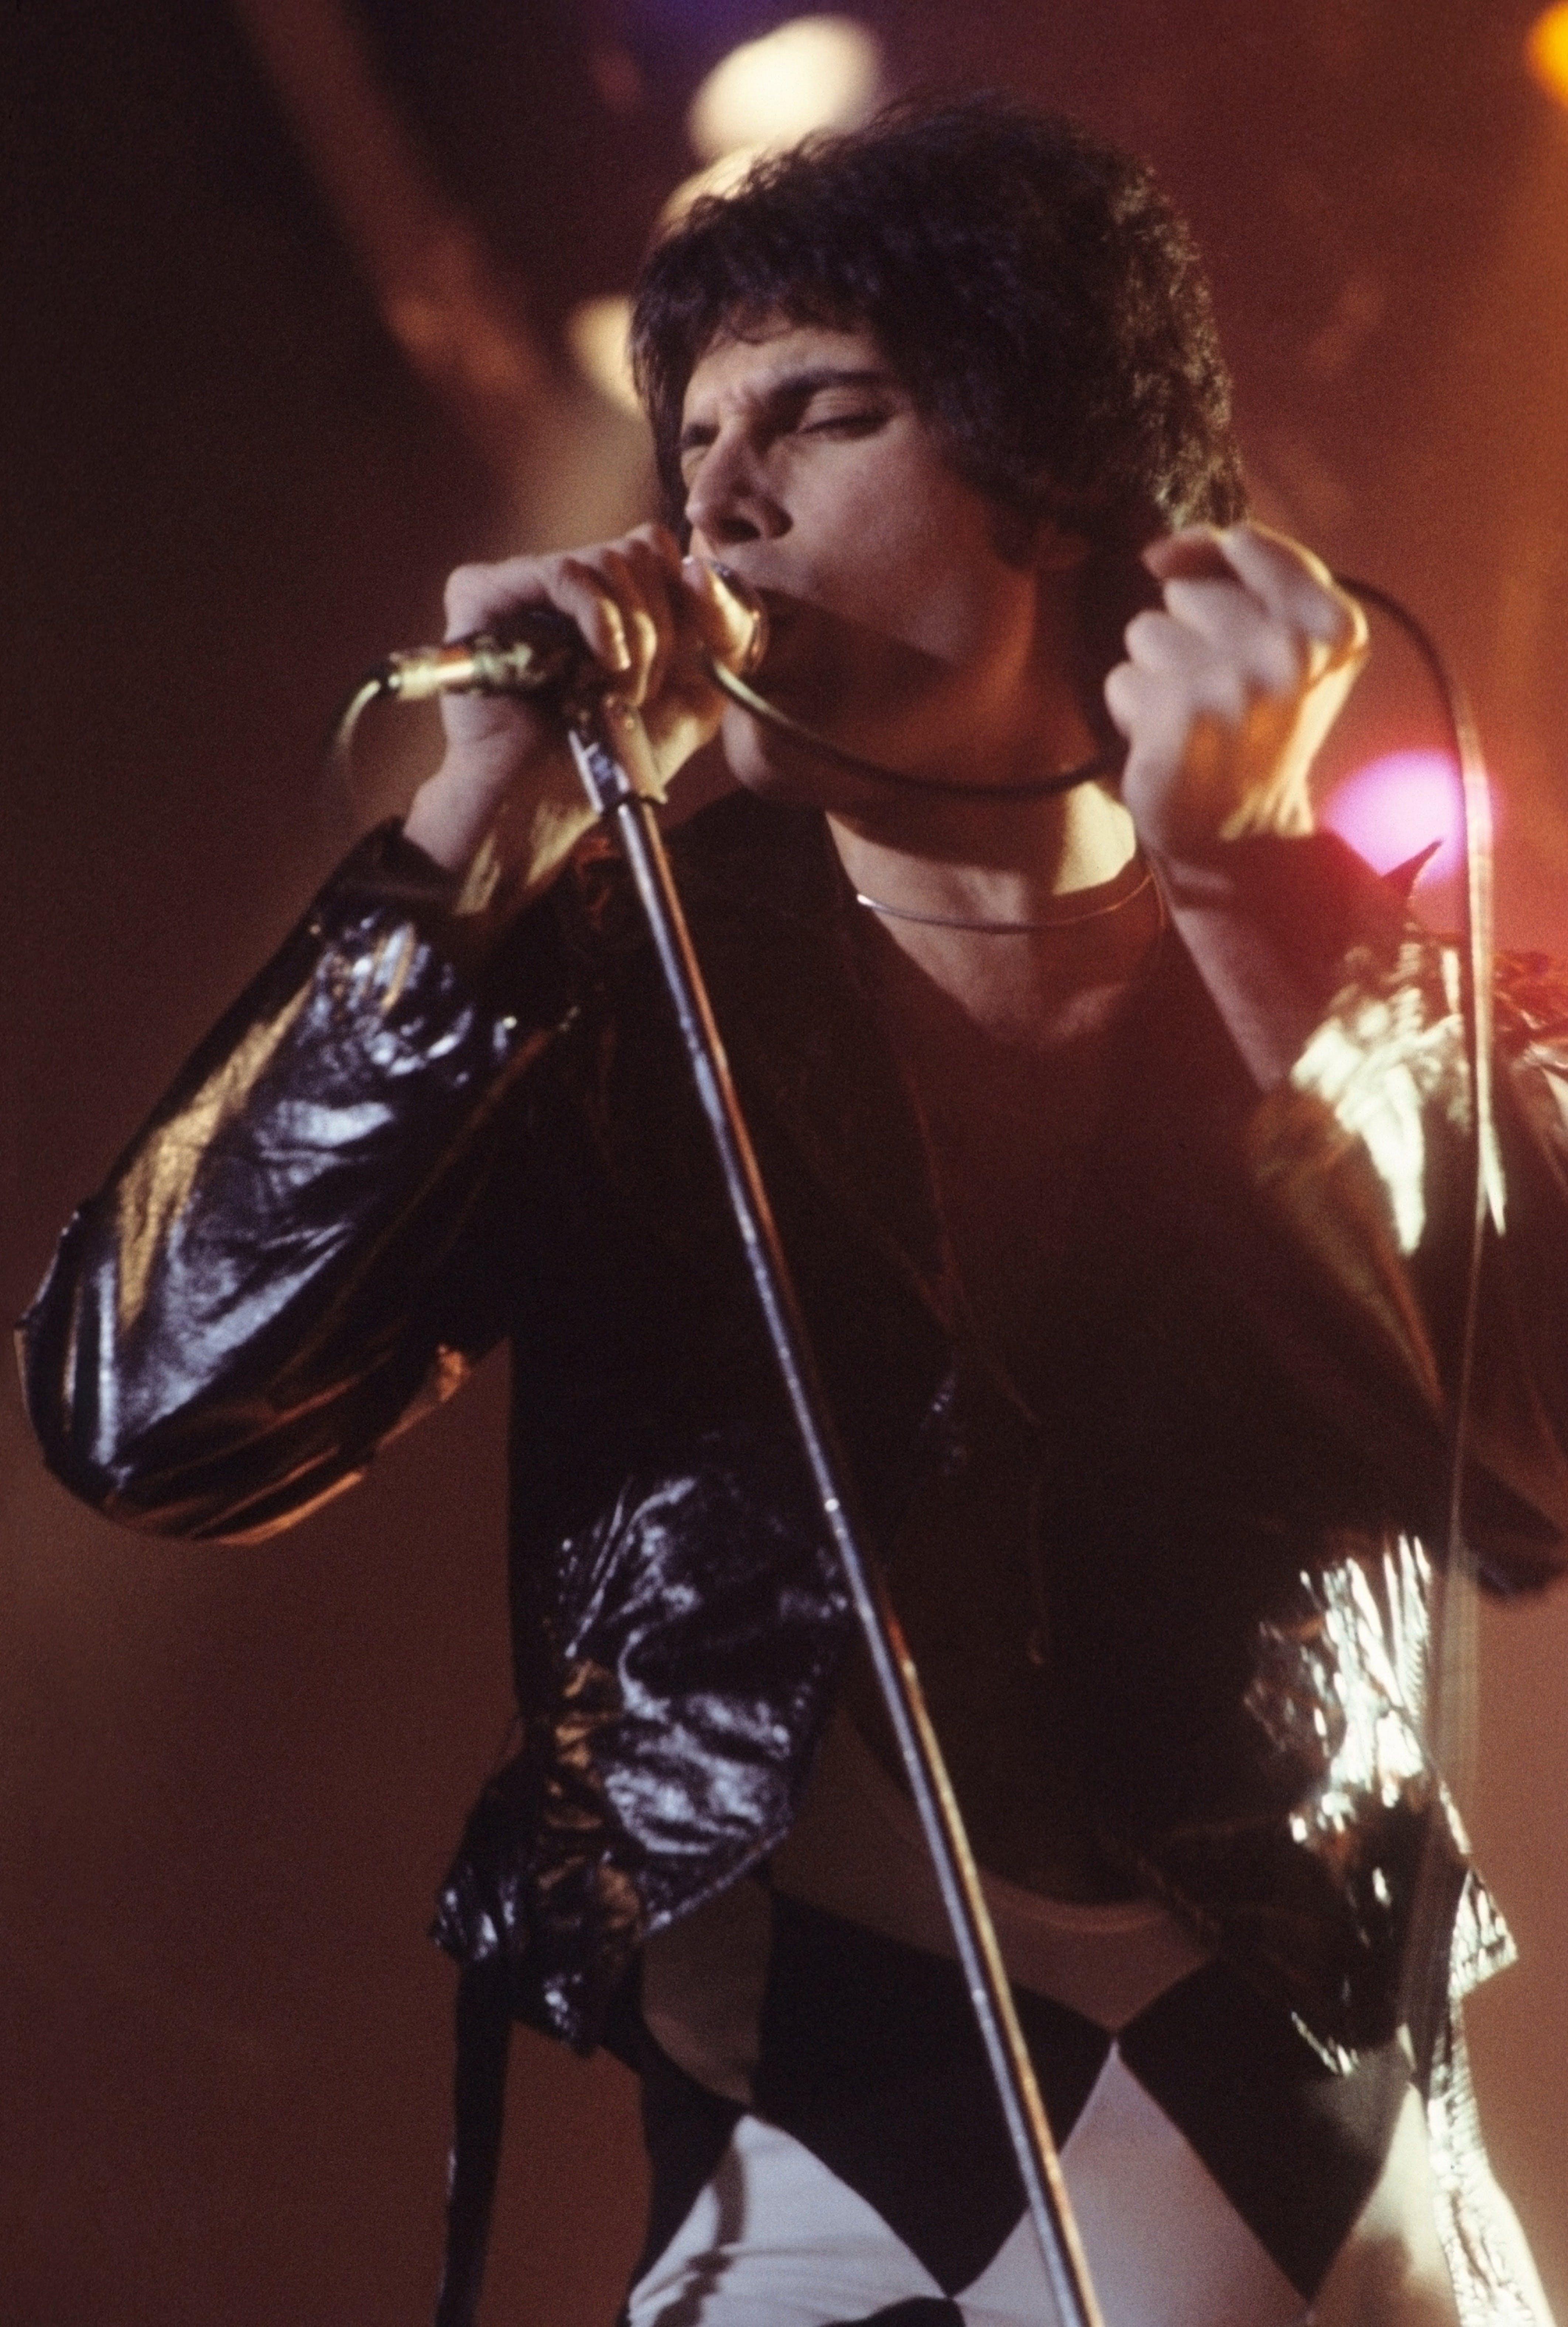 artist, celebrity, freddie mercury